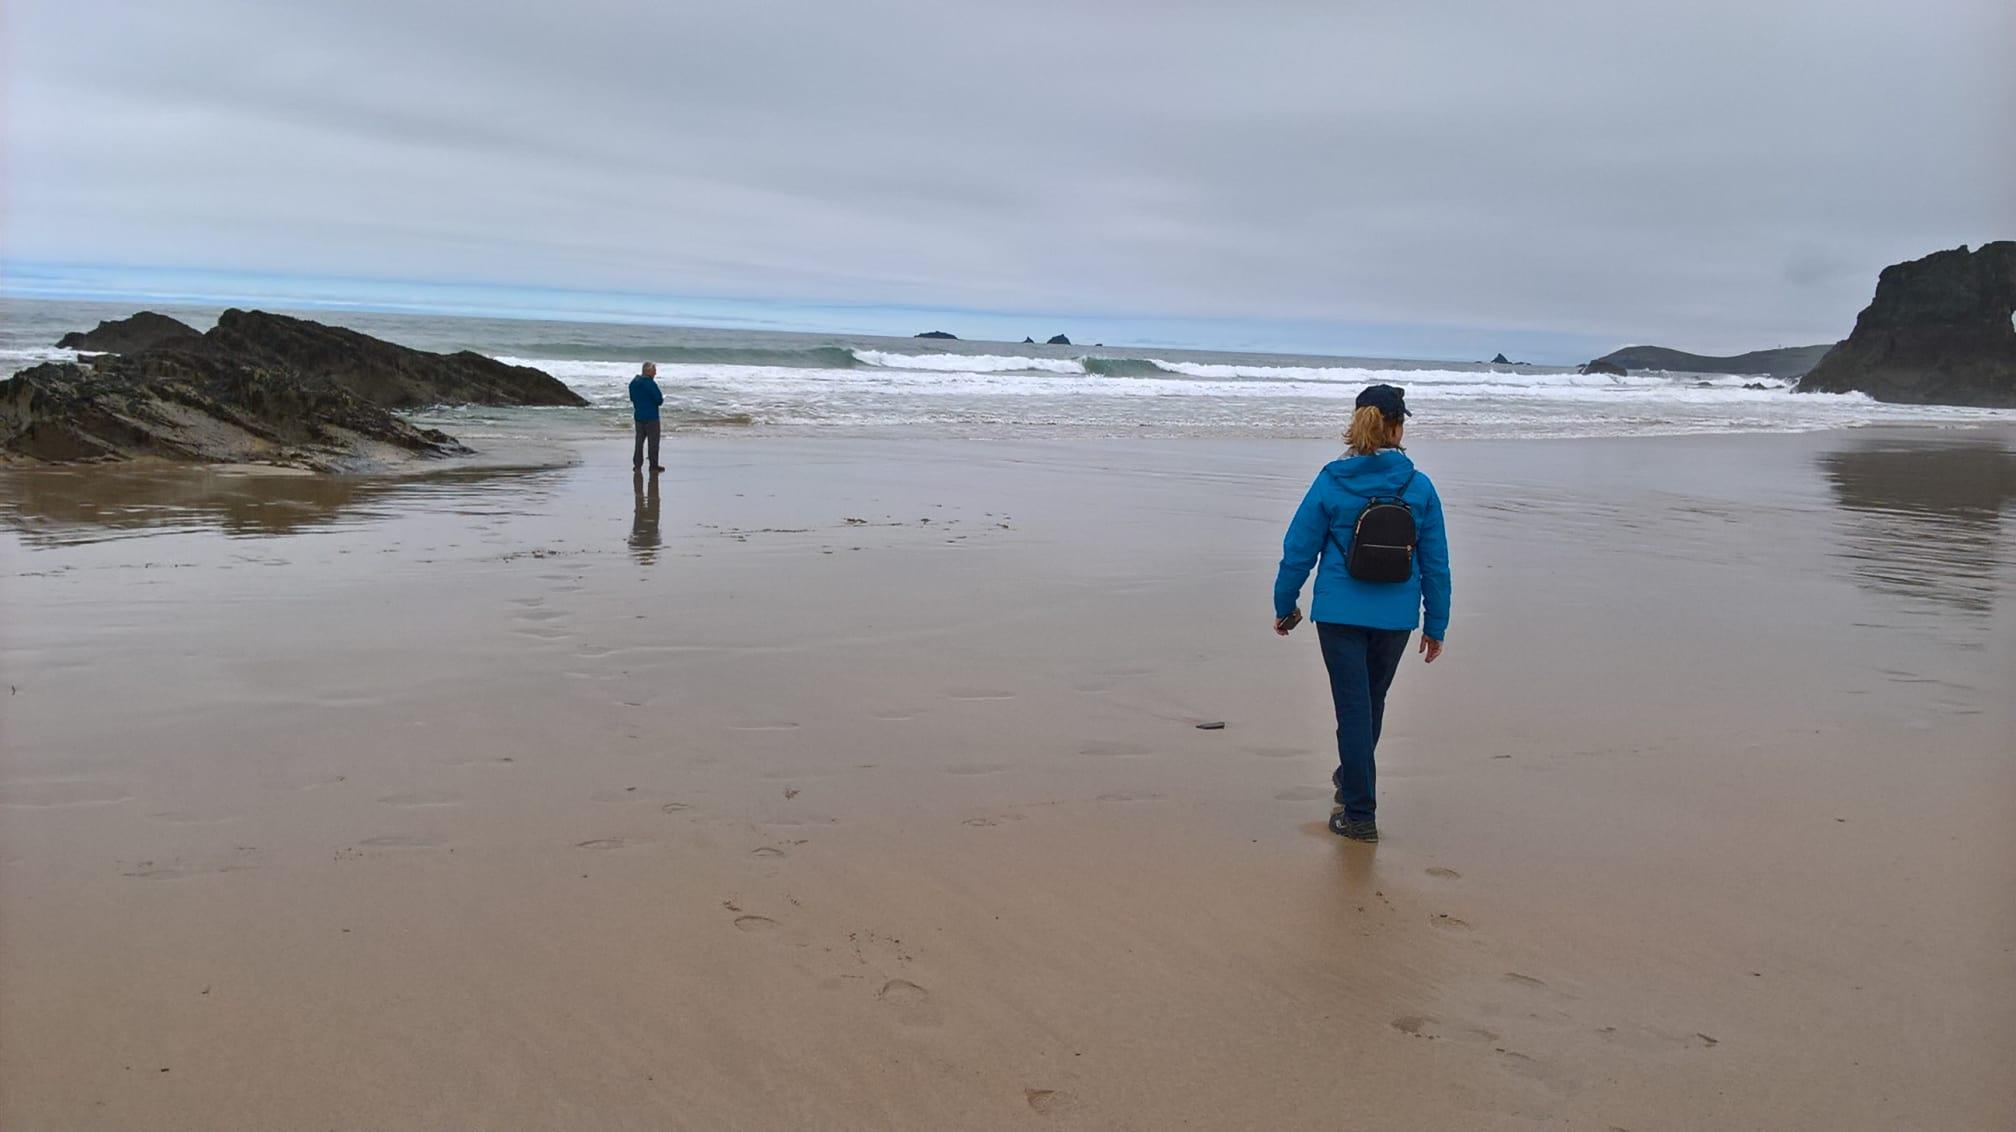 Keith's Cornish Tours